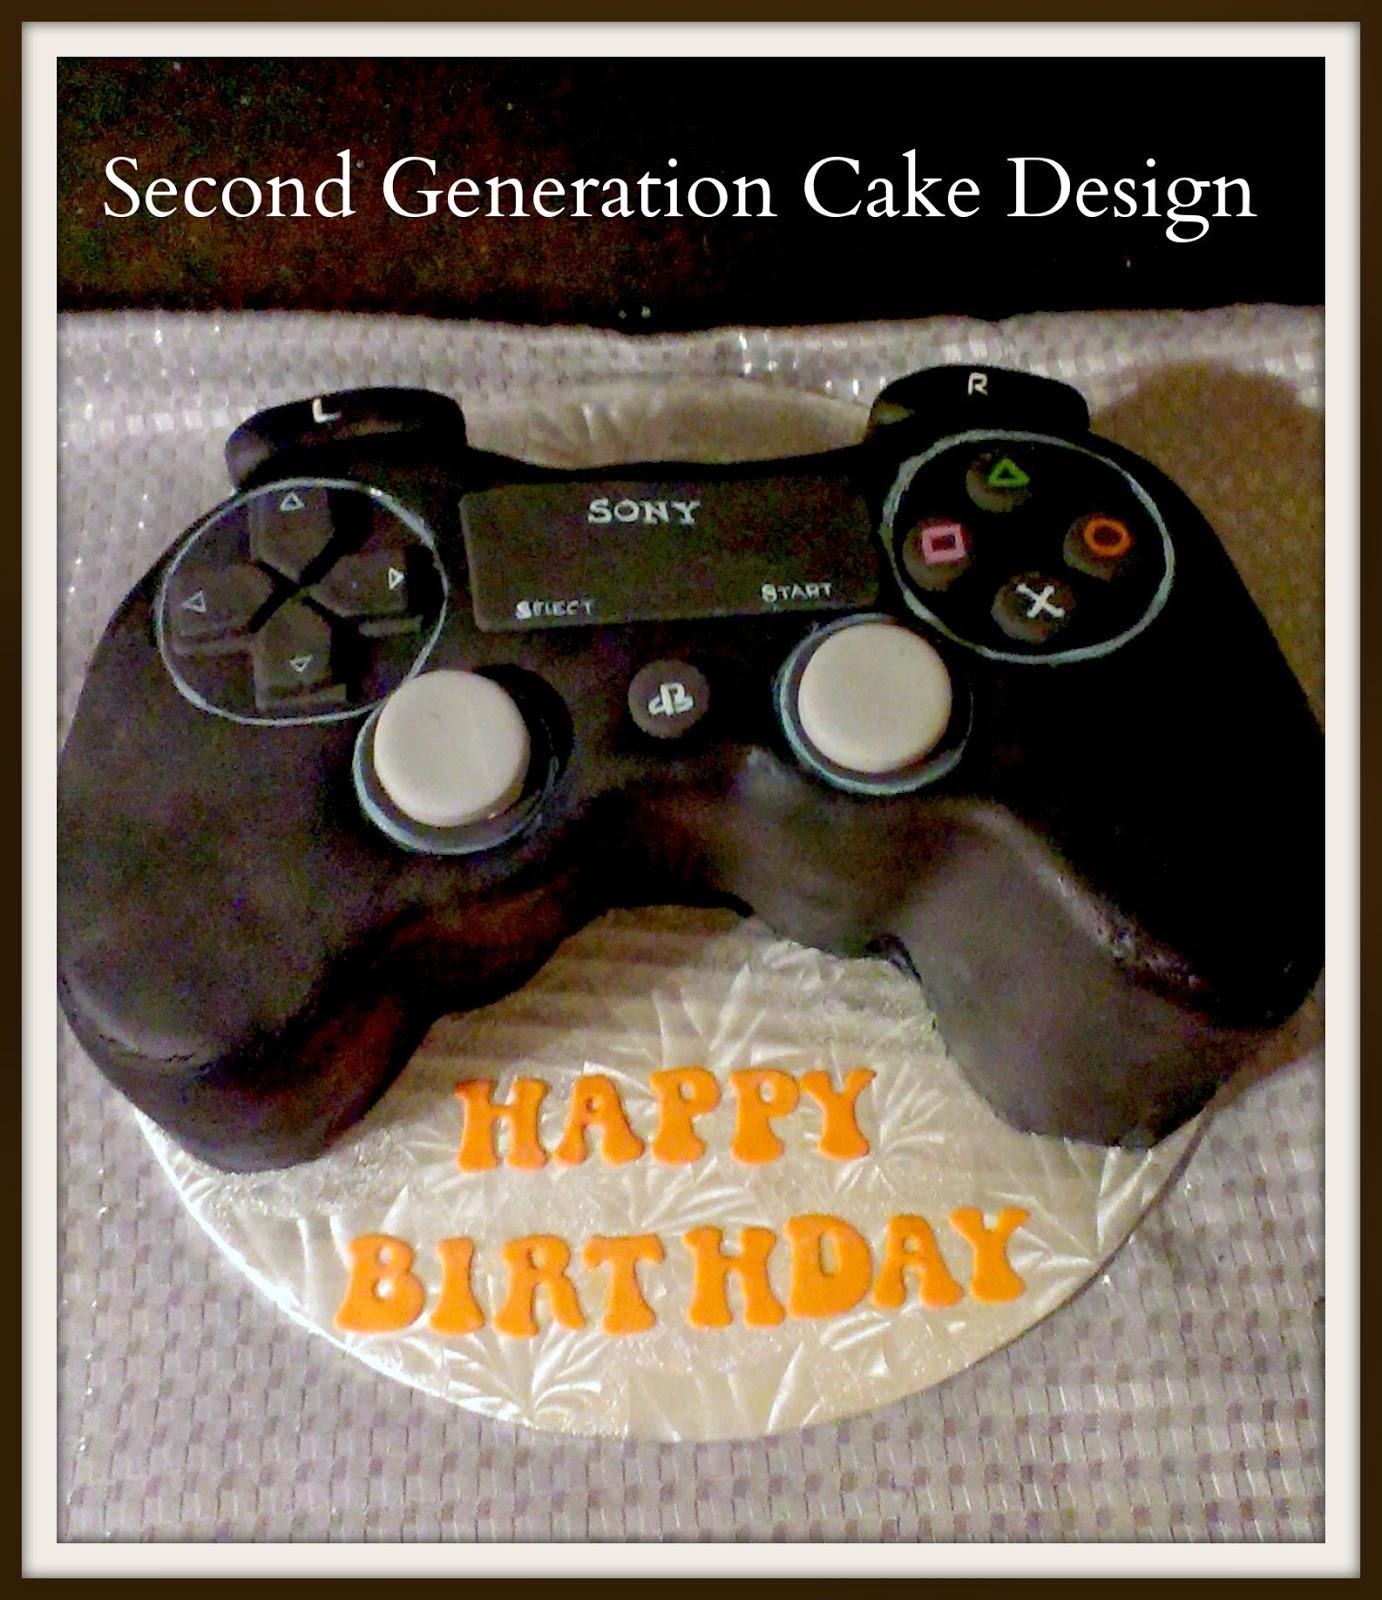 PS4 Controller Birthday Cake